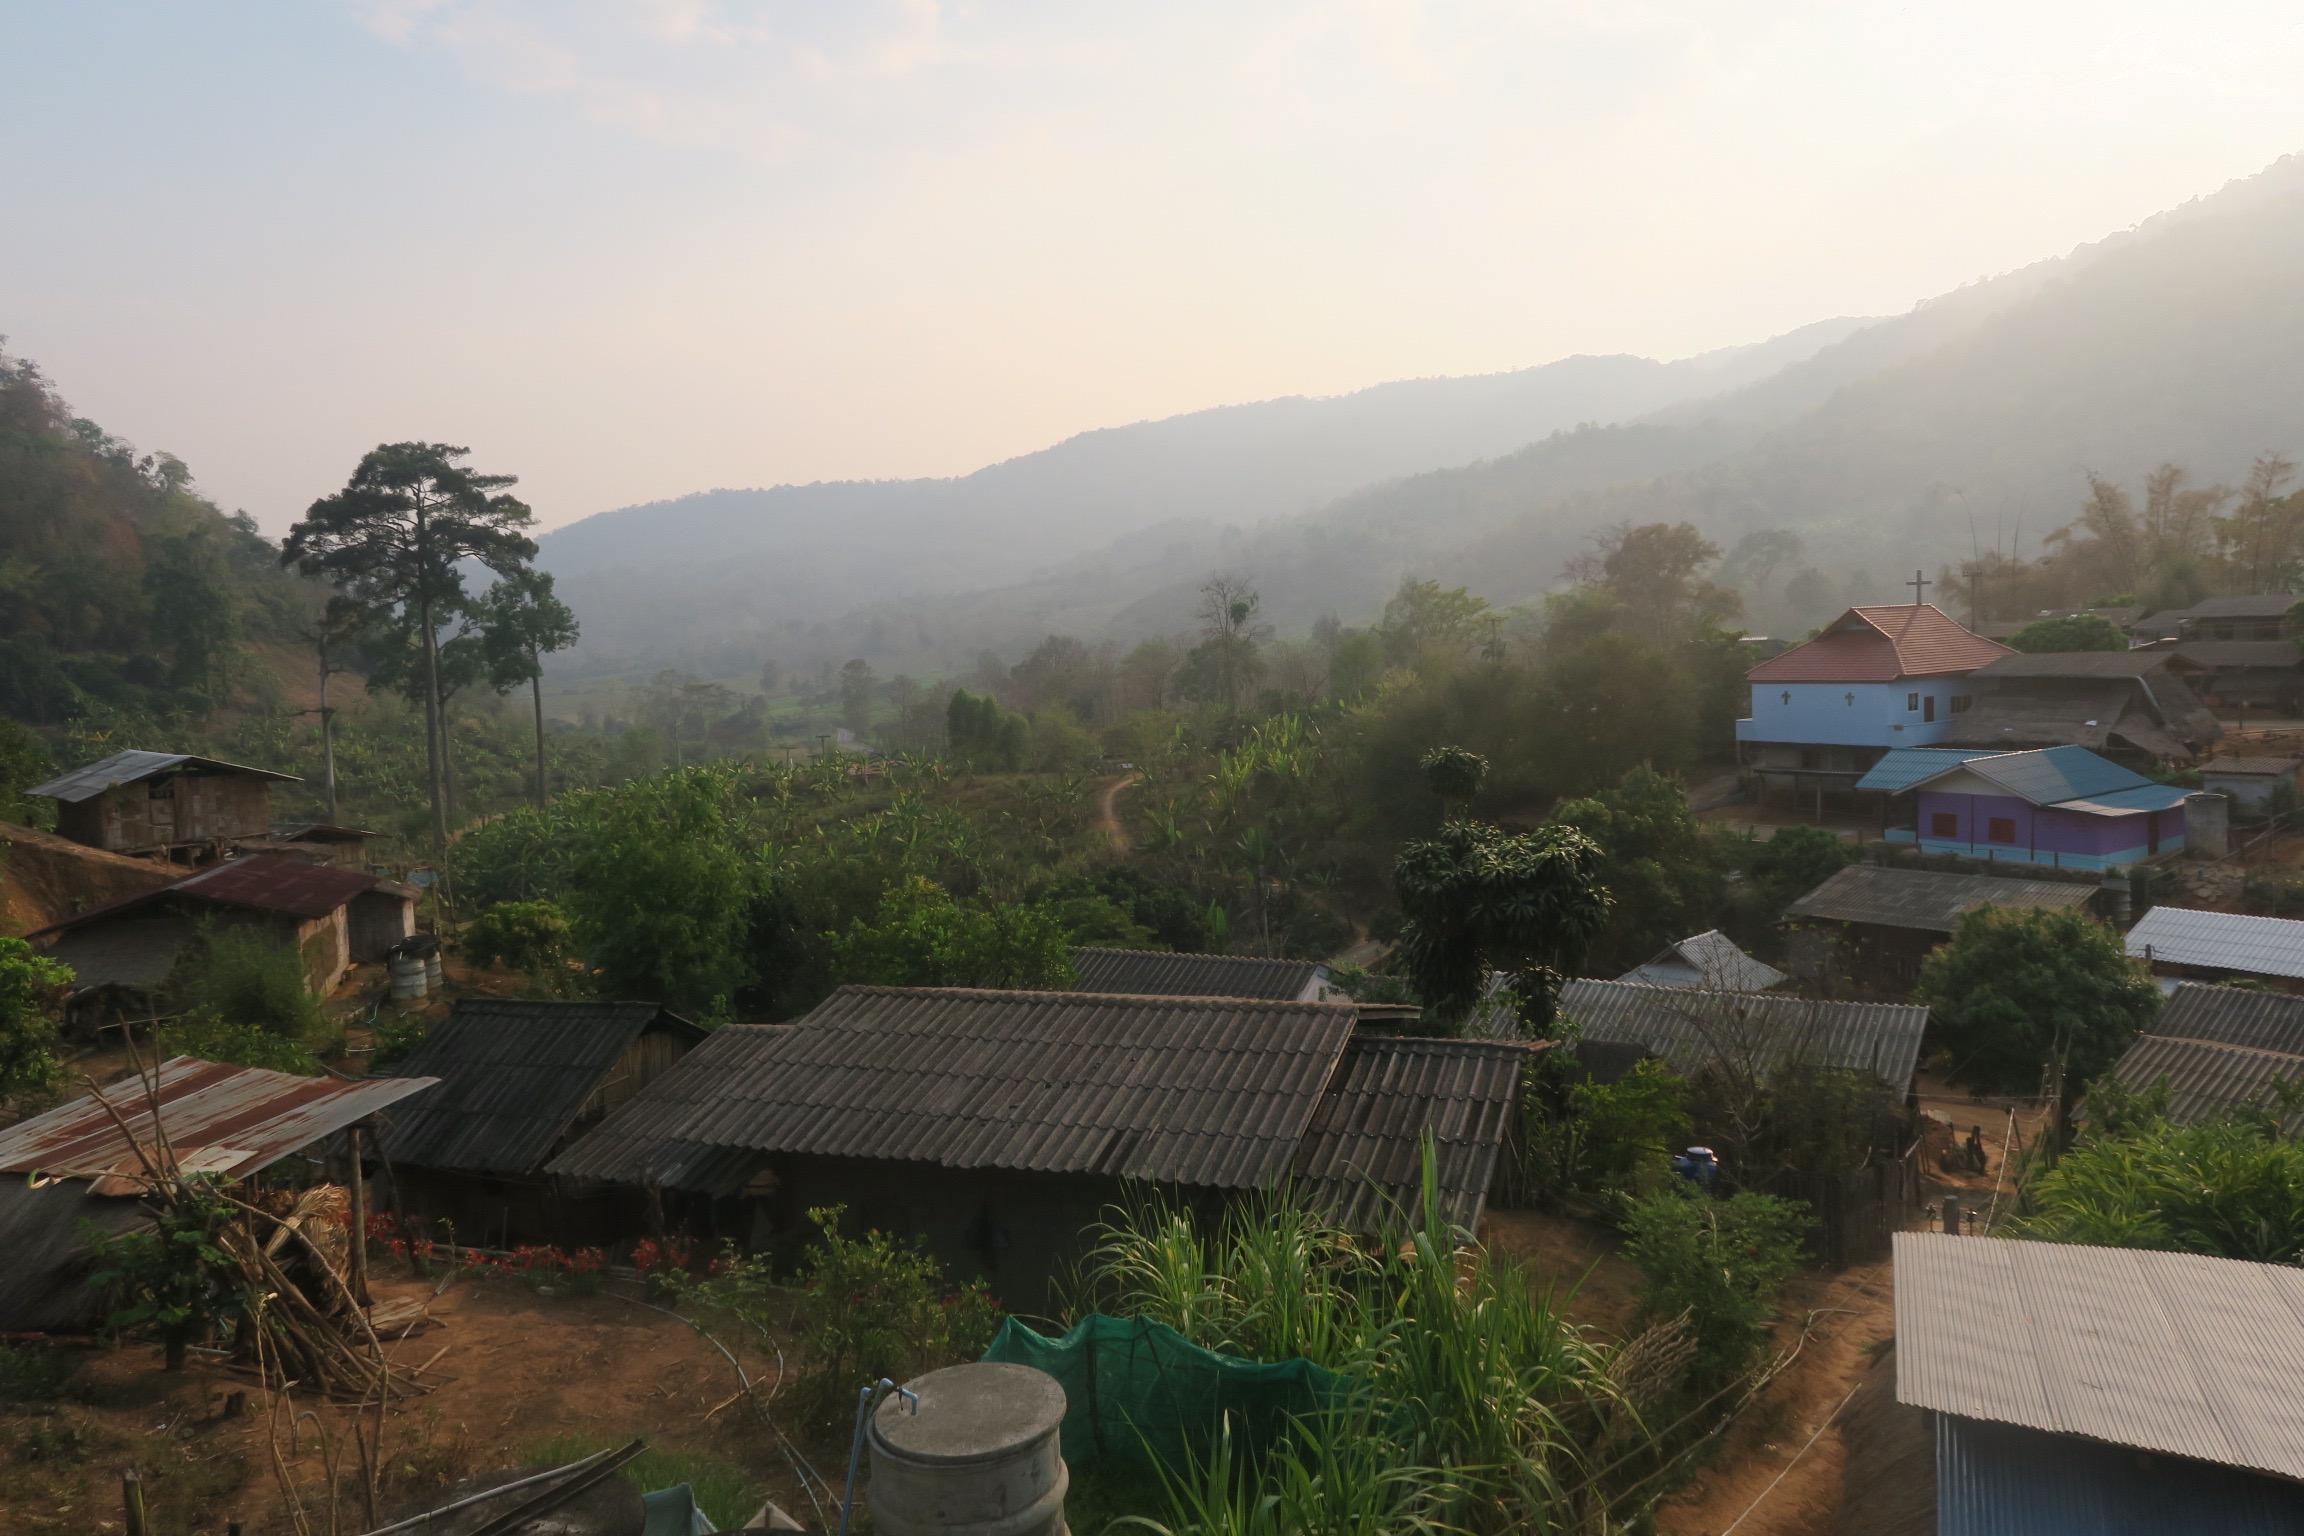 The Akha community village.